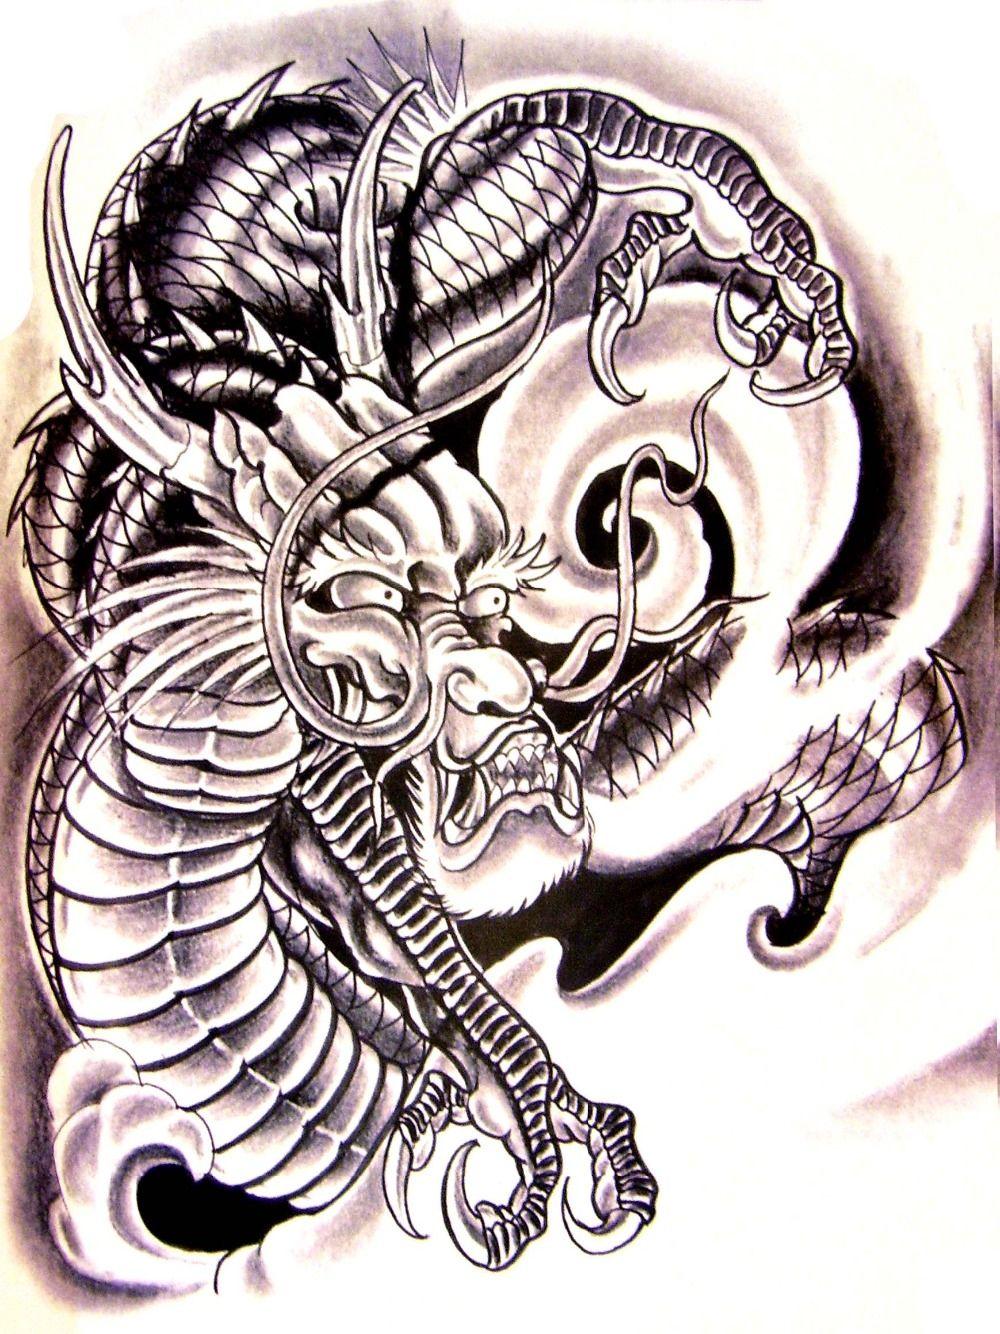 Tattoo Flash Book Tattoo Designs Sketch Free Shipping In Tattoo